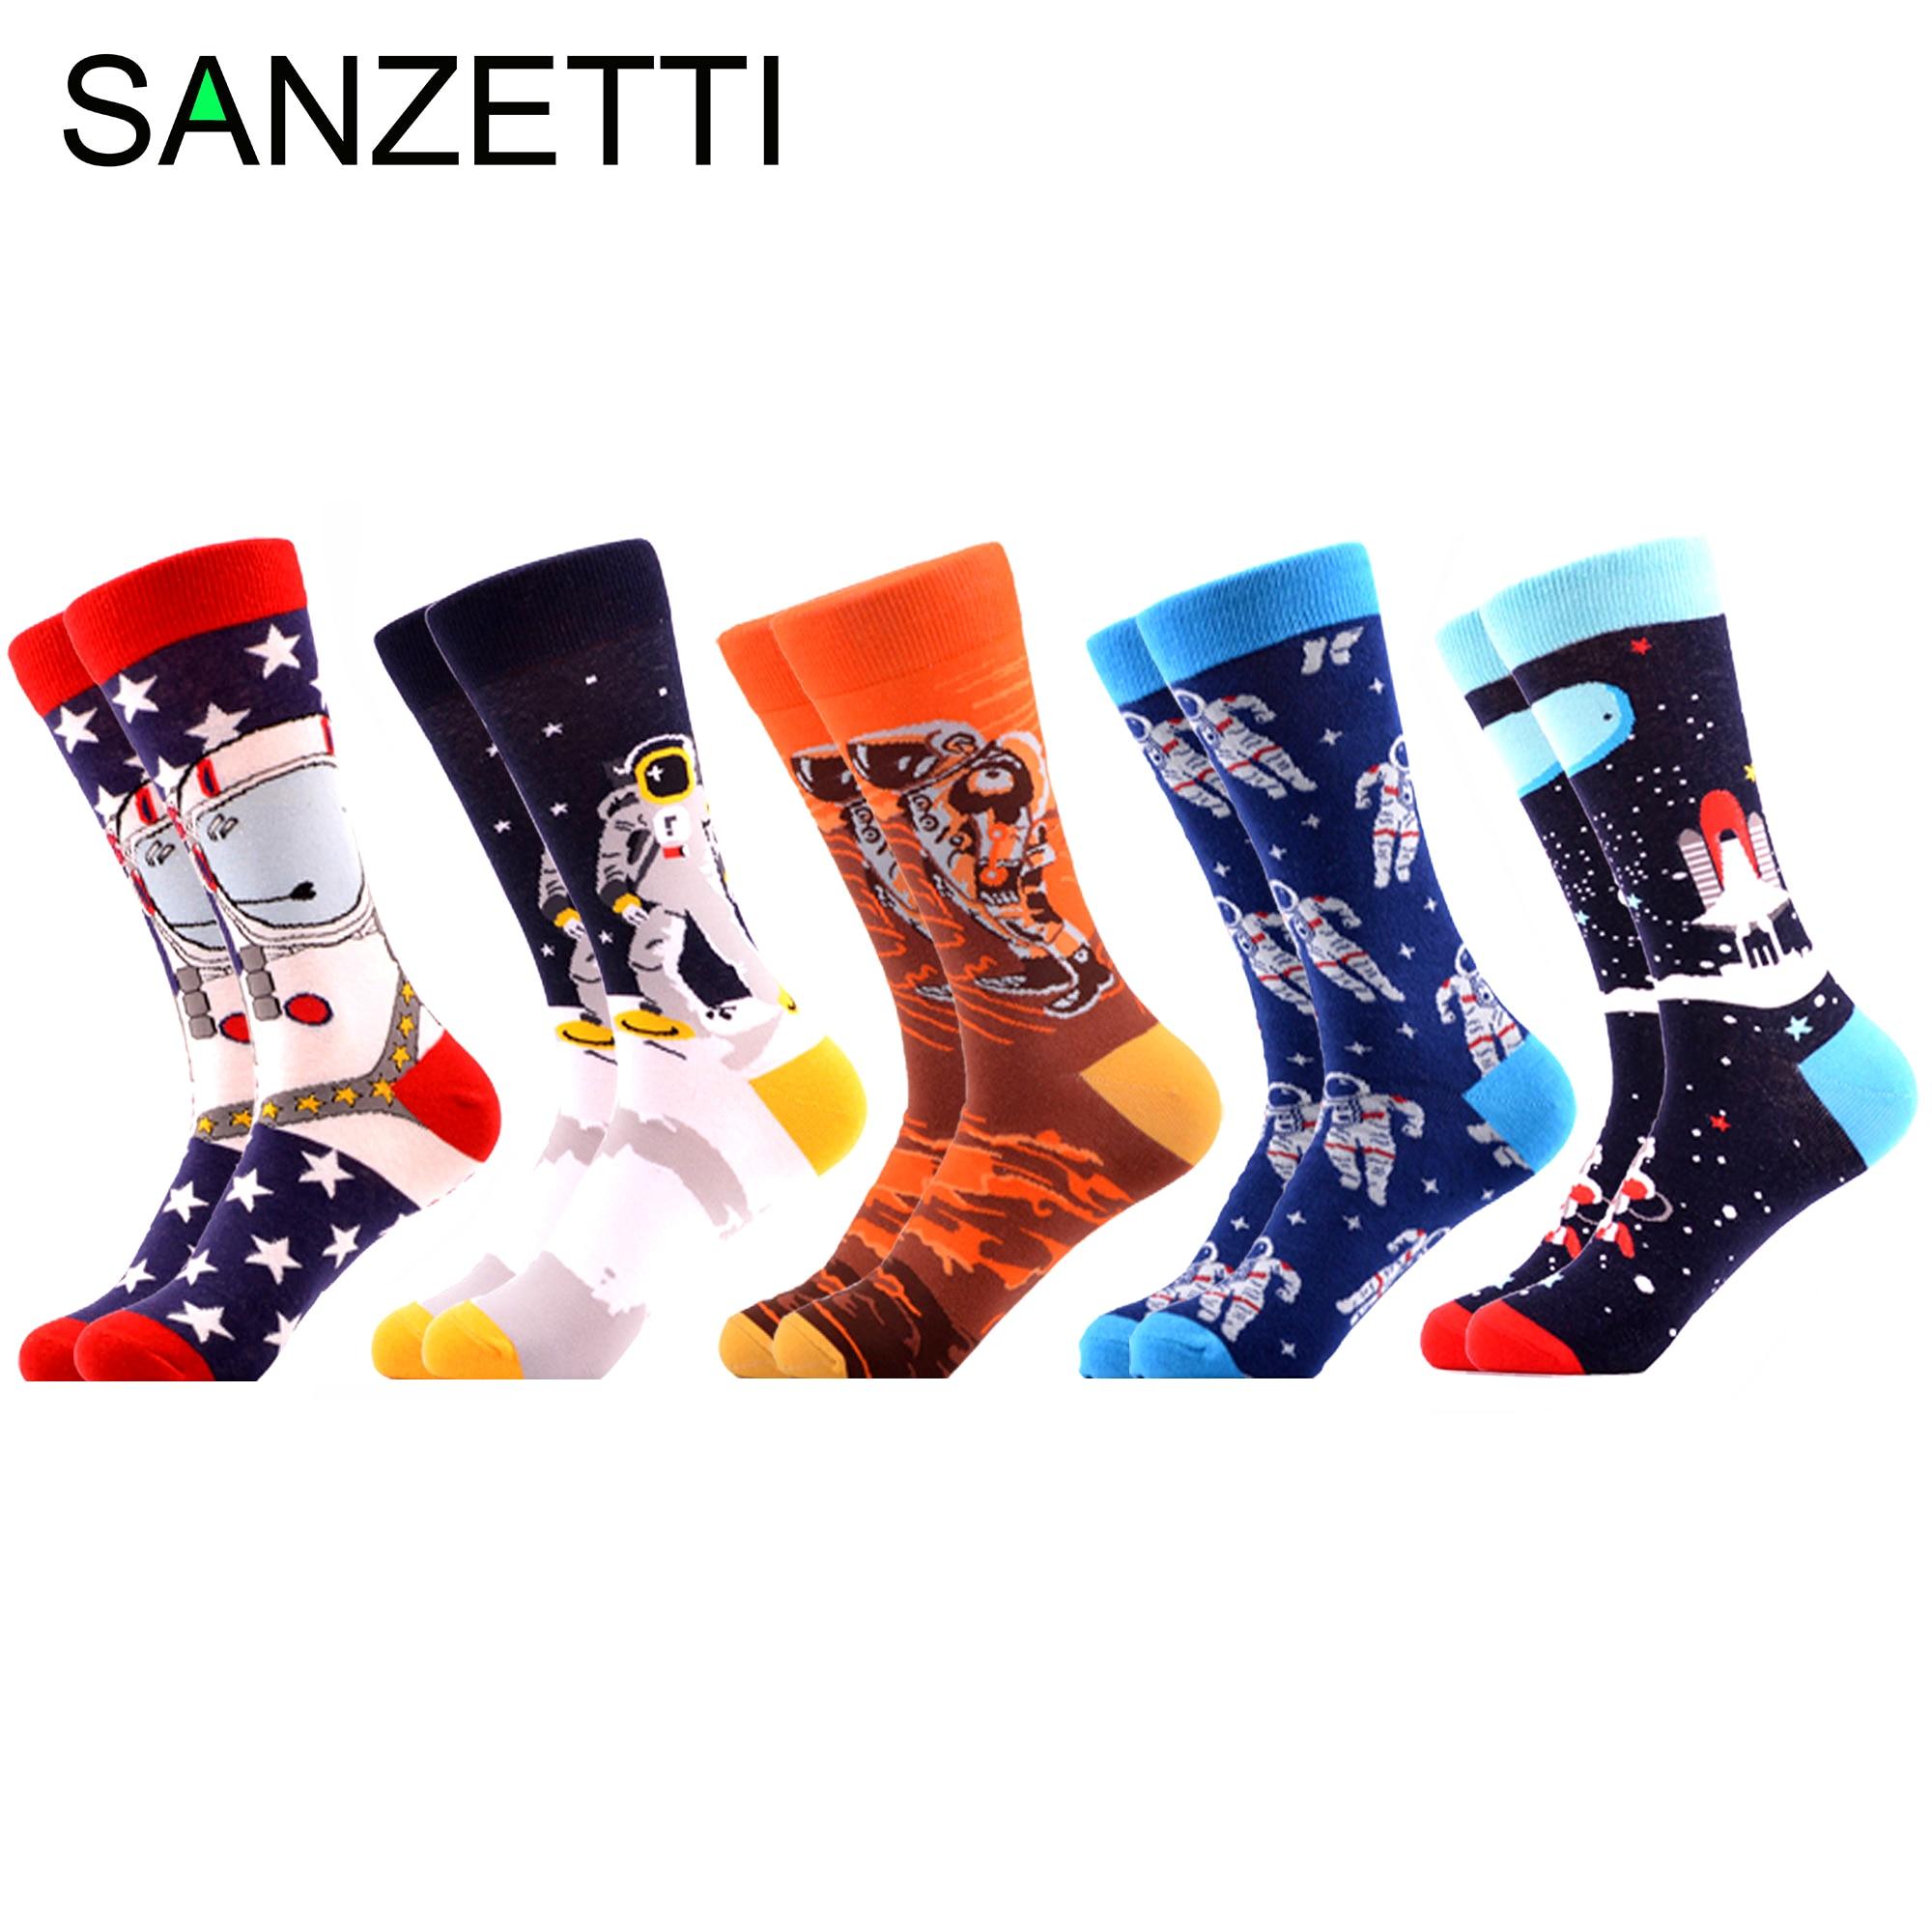 SANZETTI Brand 2020 New Happy Men Socks Bright Colorful Space Animal Novelty Pattern Causal Dress Socks Funny Gift Wedding Socks